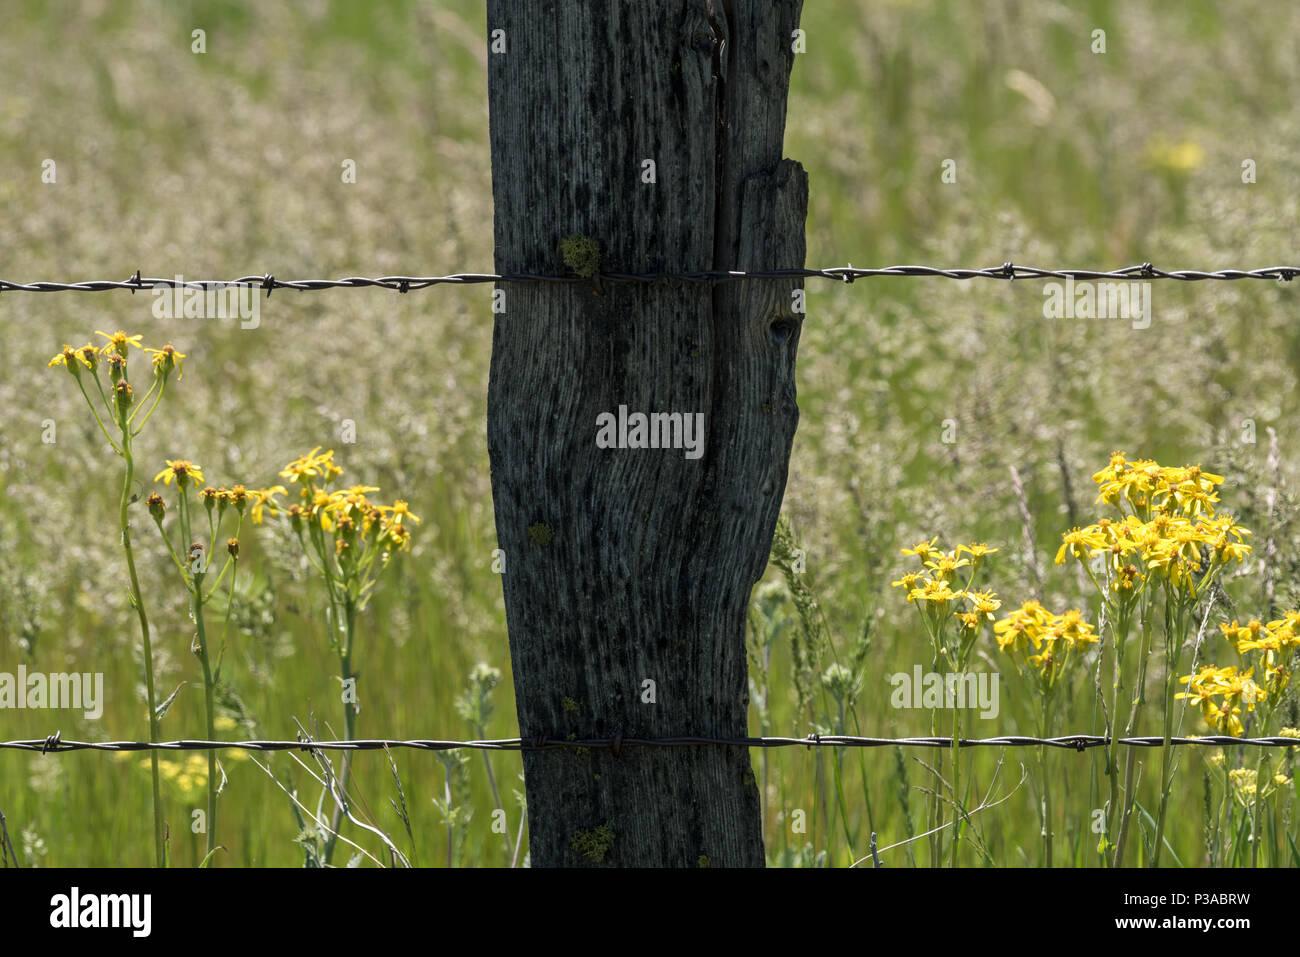 Fencepost and flowers, Zumwalt Prairie, Oregon. - Stock Image